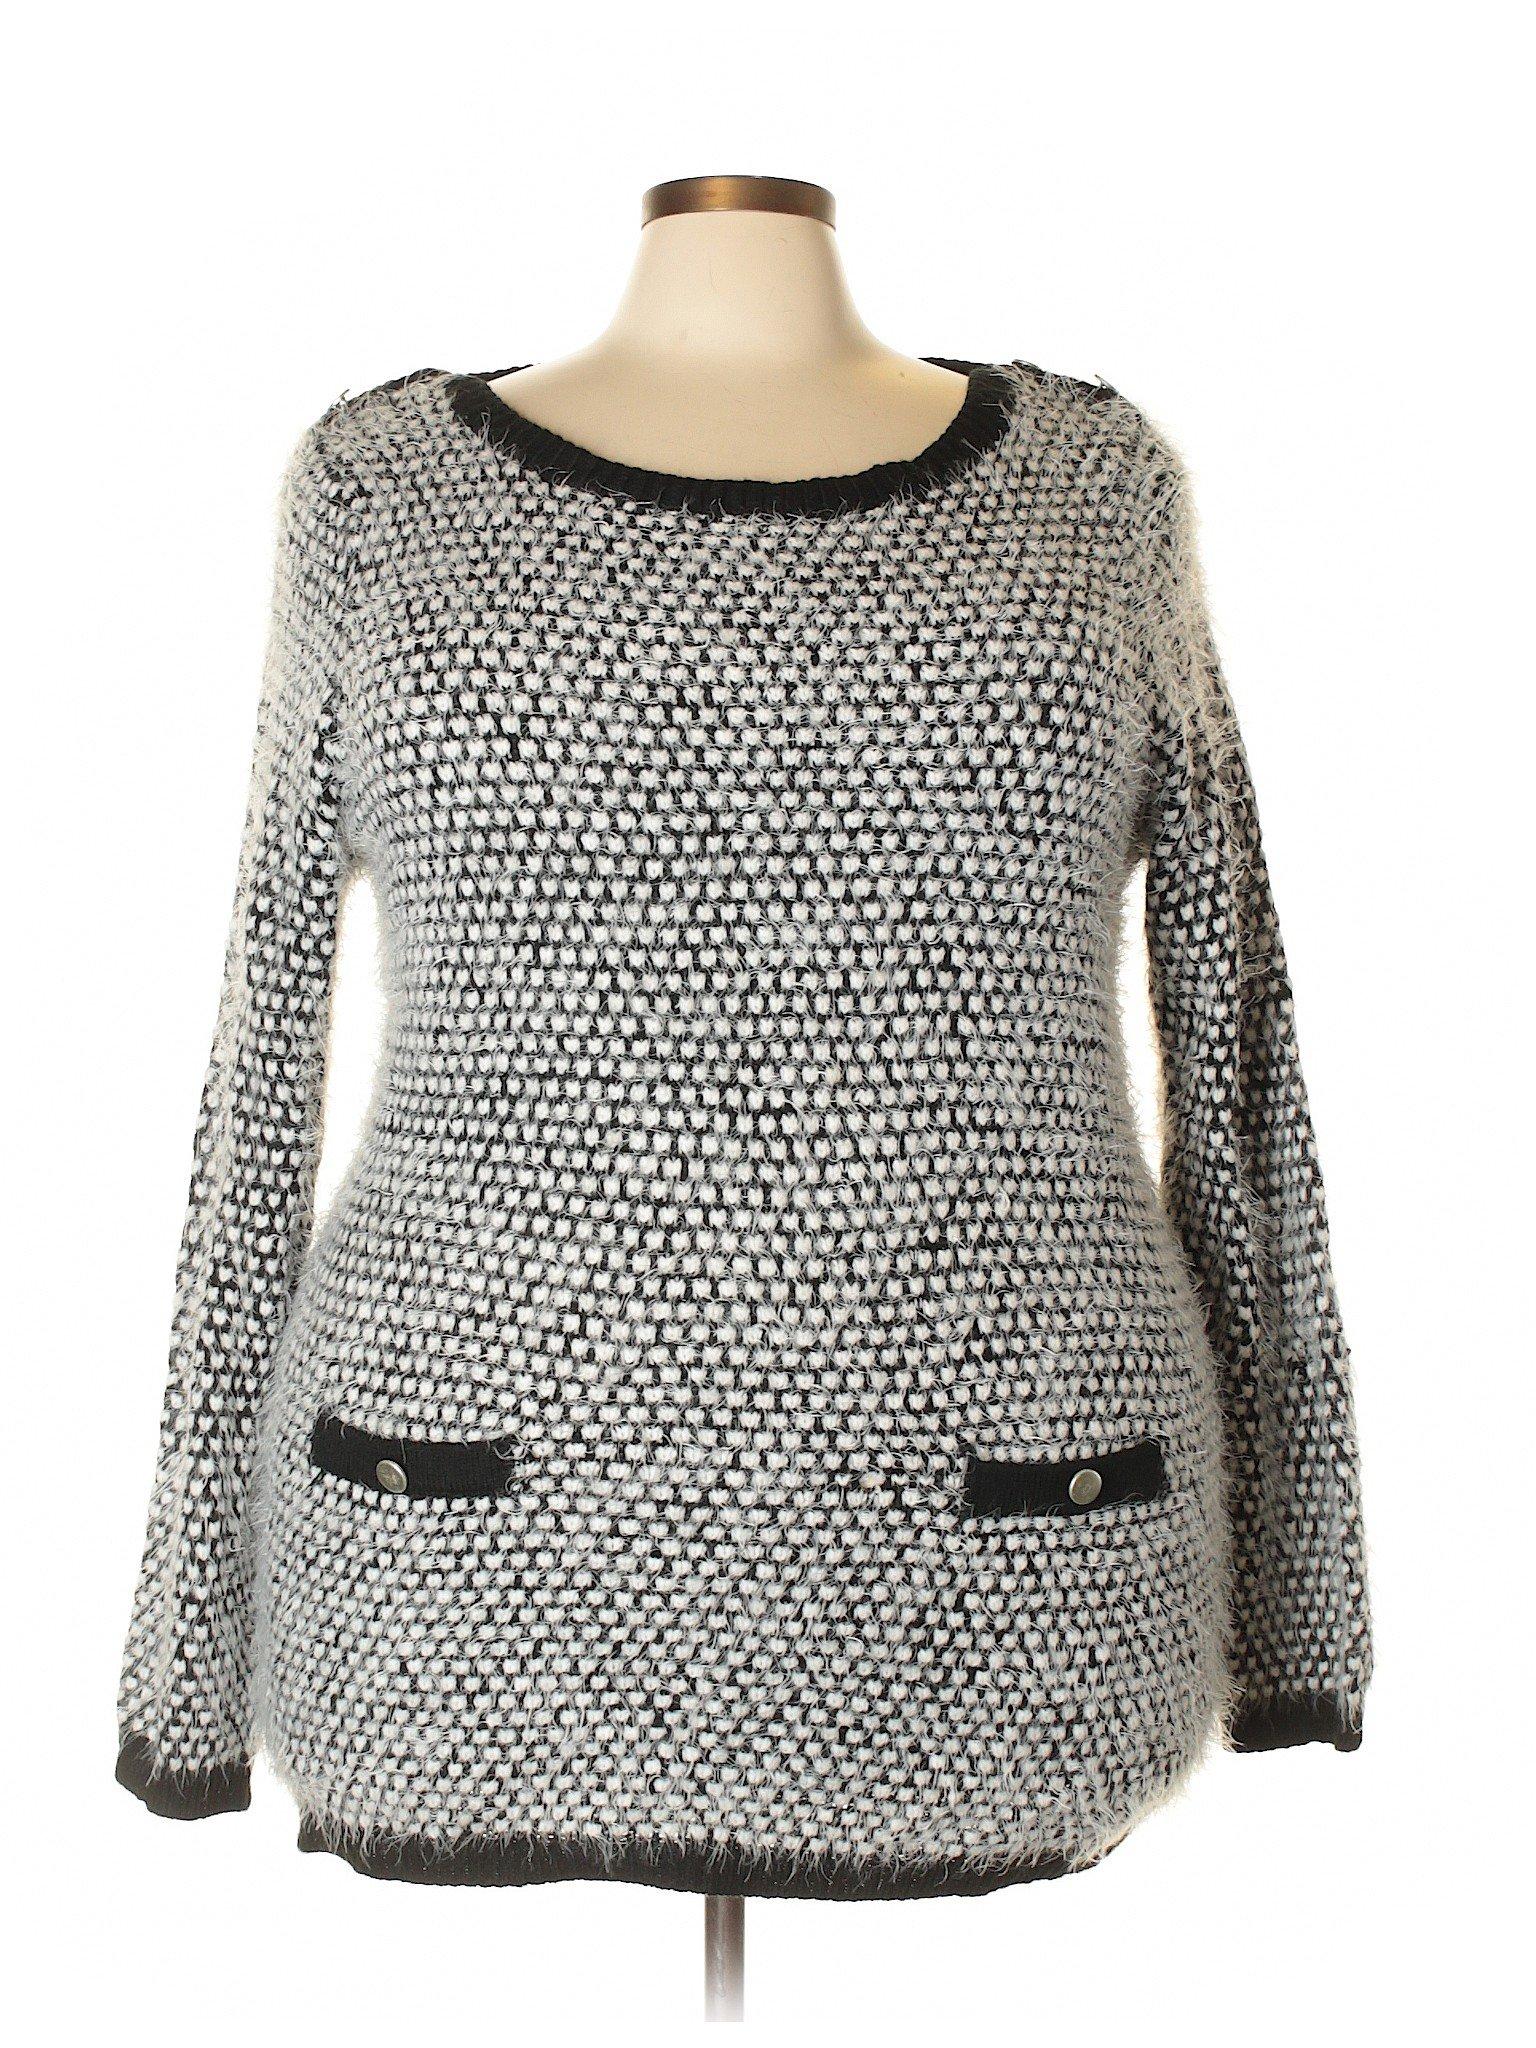 Michelle Lauren winter Sweater Pullover Boutique wZApRqv6